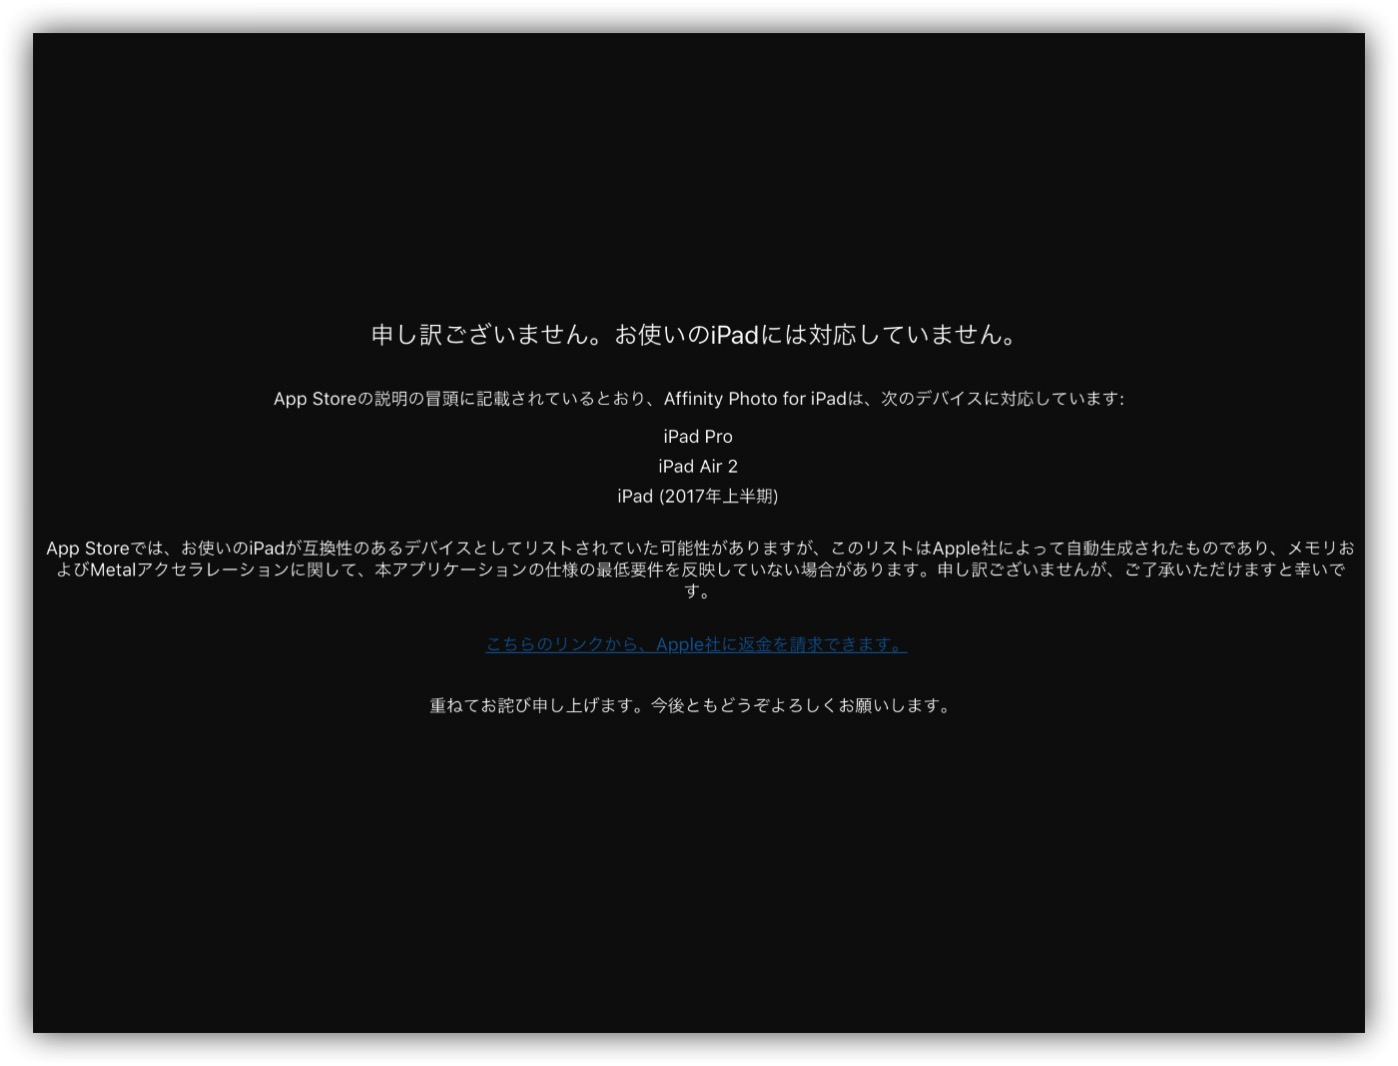 Affinity Photo for iPad-3